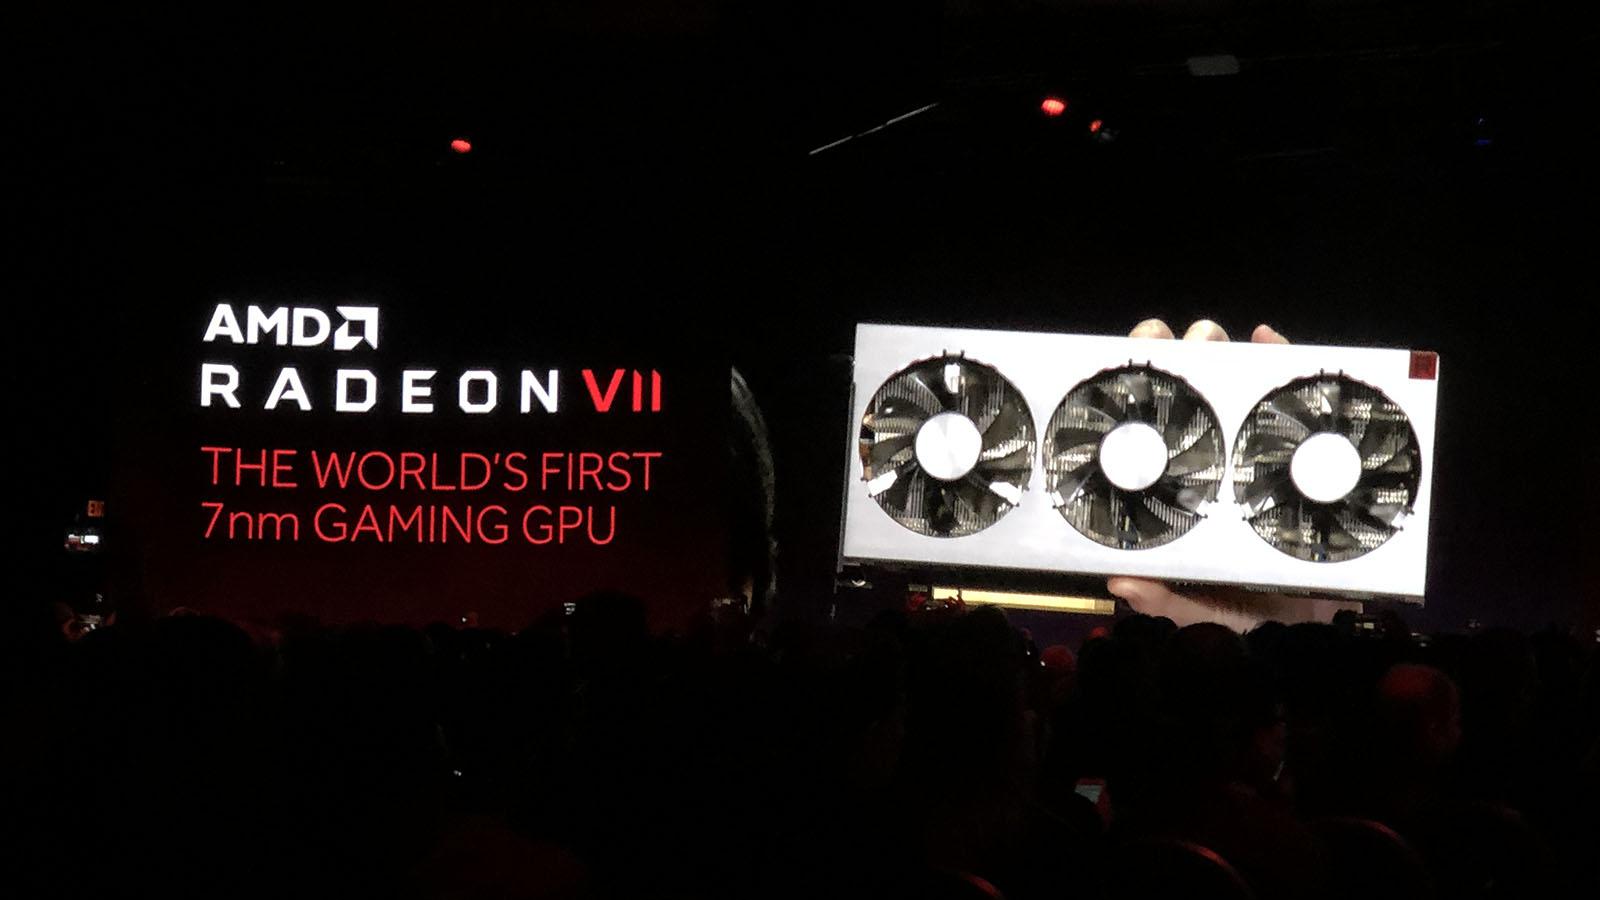 AMD Radeon VII apresentada durante a CES 2019